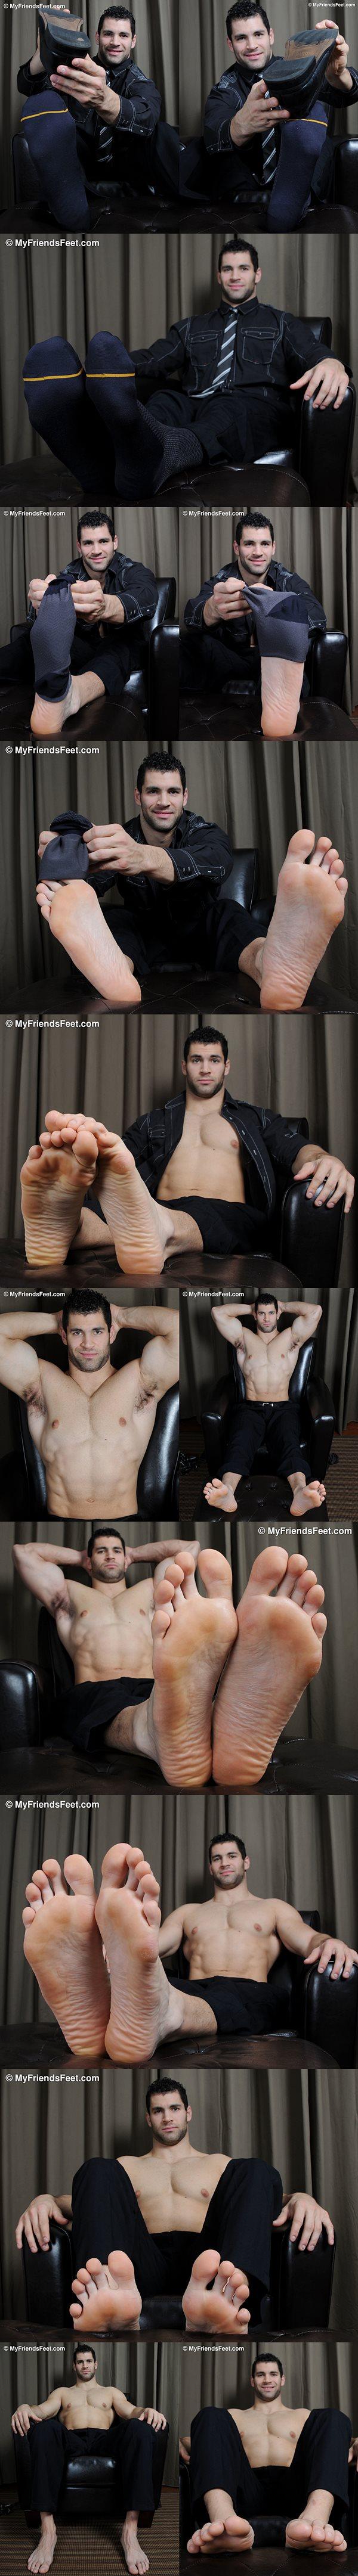 Muscle god Vinnie's photo shot of dark business suits at Myfriendsfeet